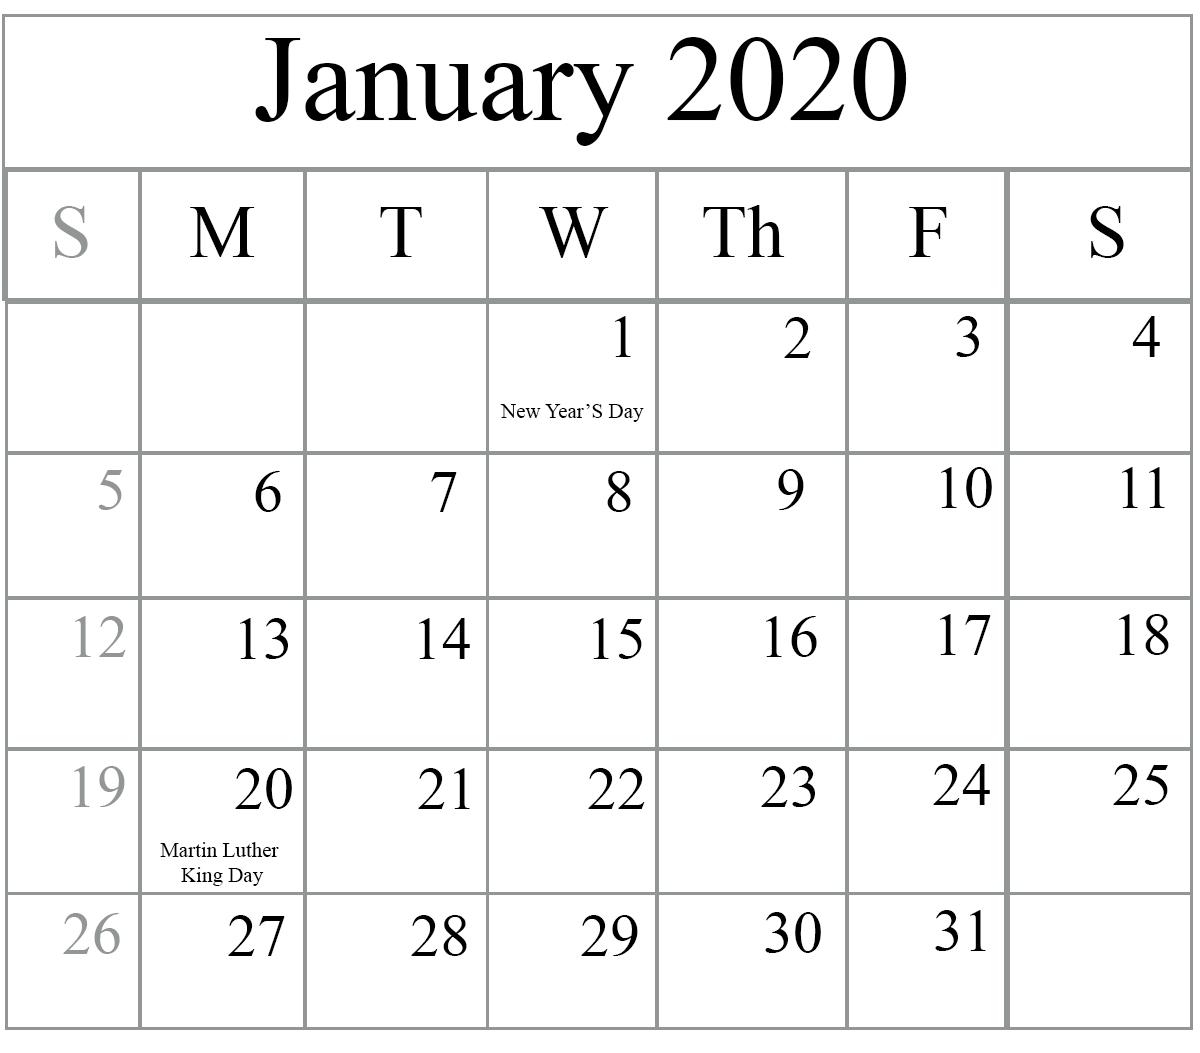 Free January 2020 Printable Calendar In Pdf, Excel & Word regarding 2020 Calendars That You Can Edit